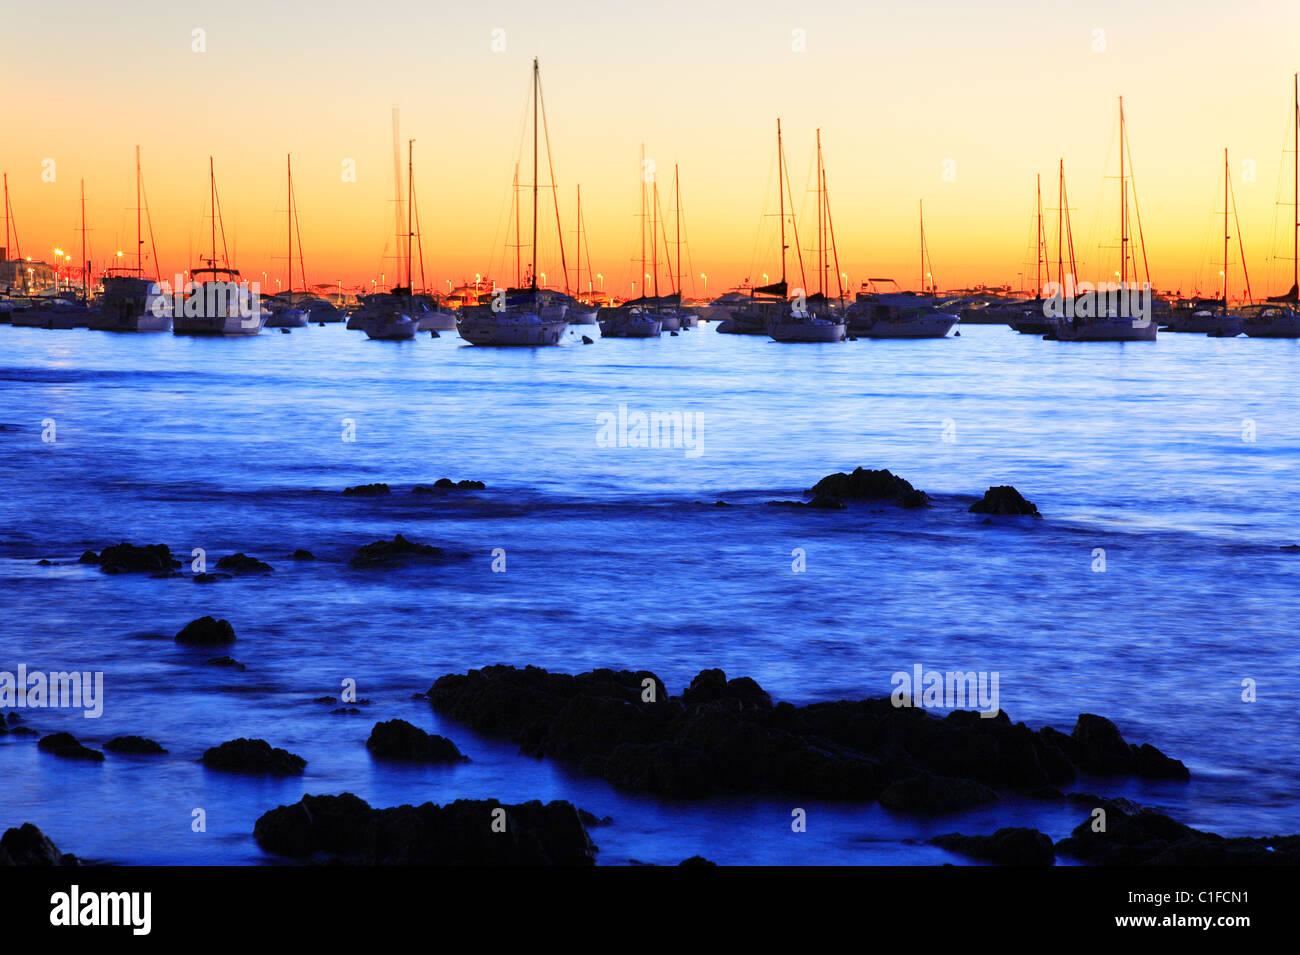 yatchs at Punta del Este coast, at sunset. Maldonado, Uruguay, south america - Stock Image